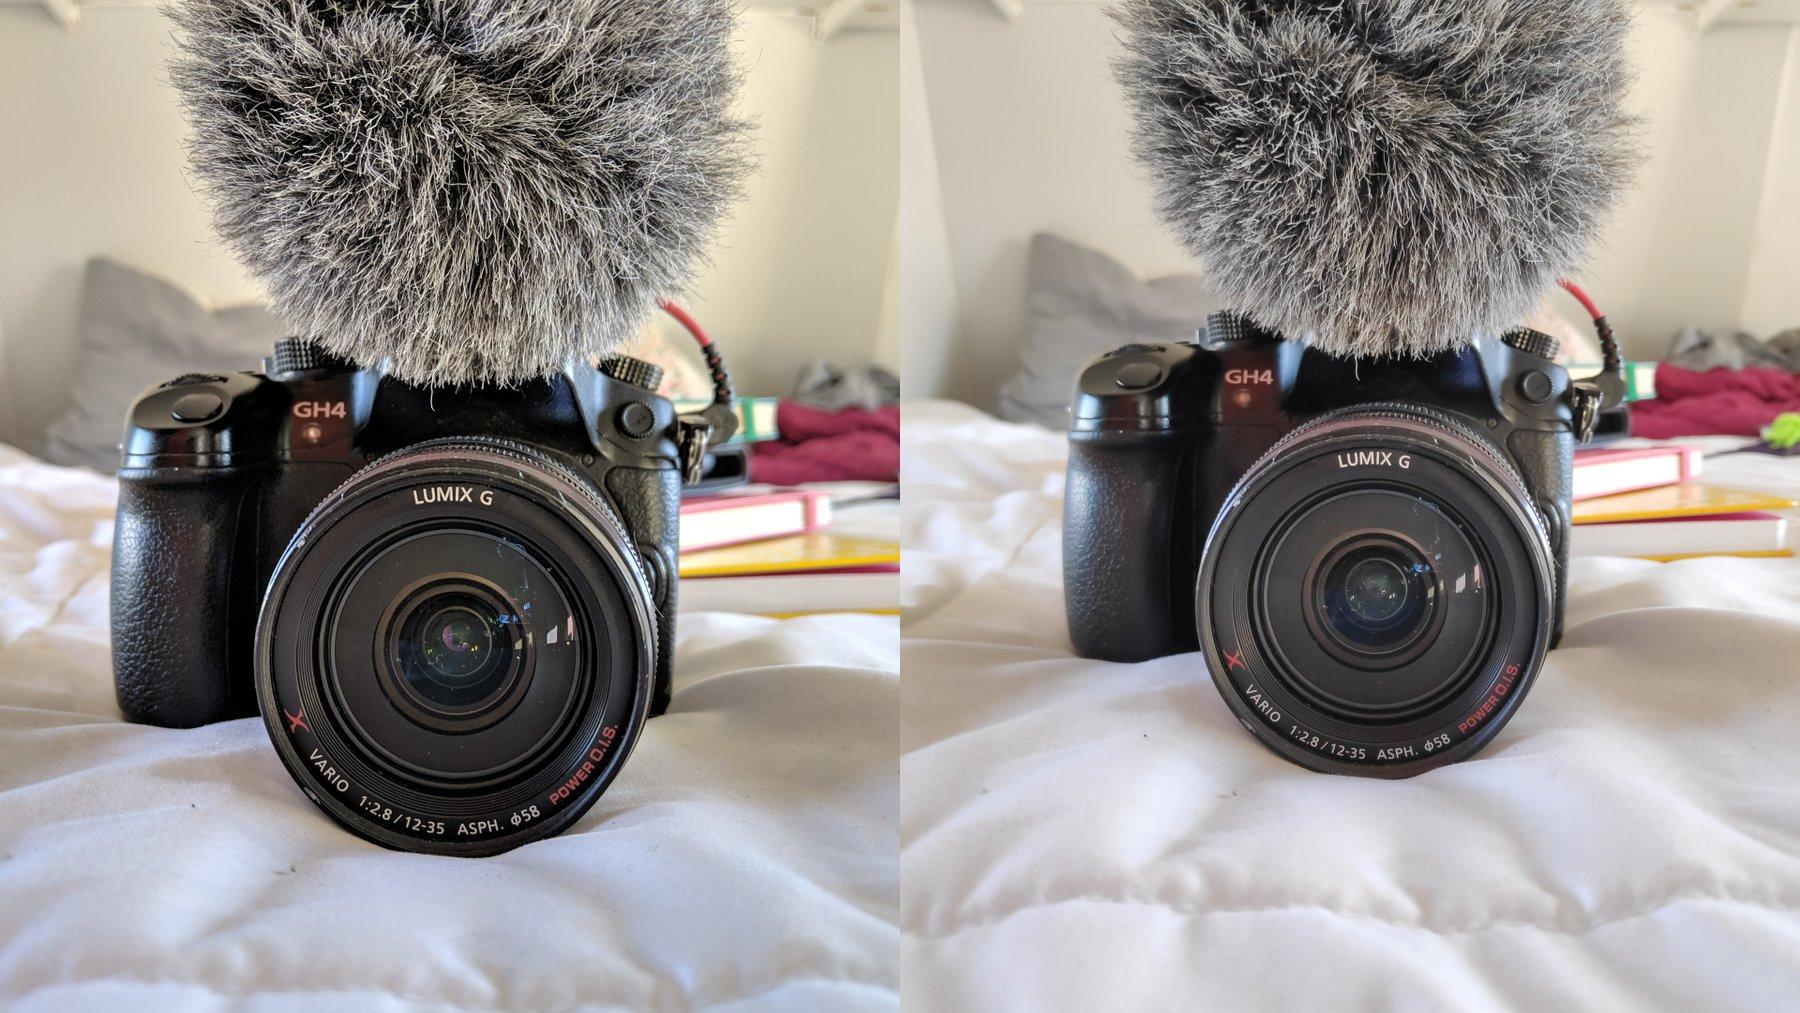 Pixel 3 versus Pocophone F1 camera comparison